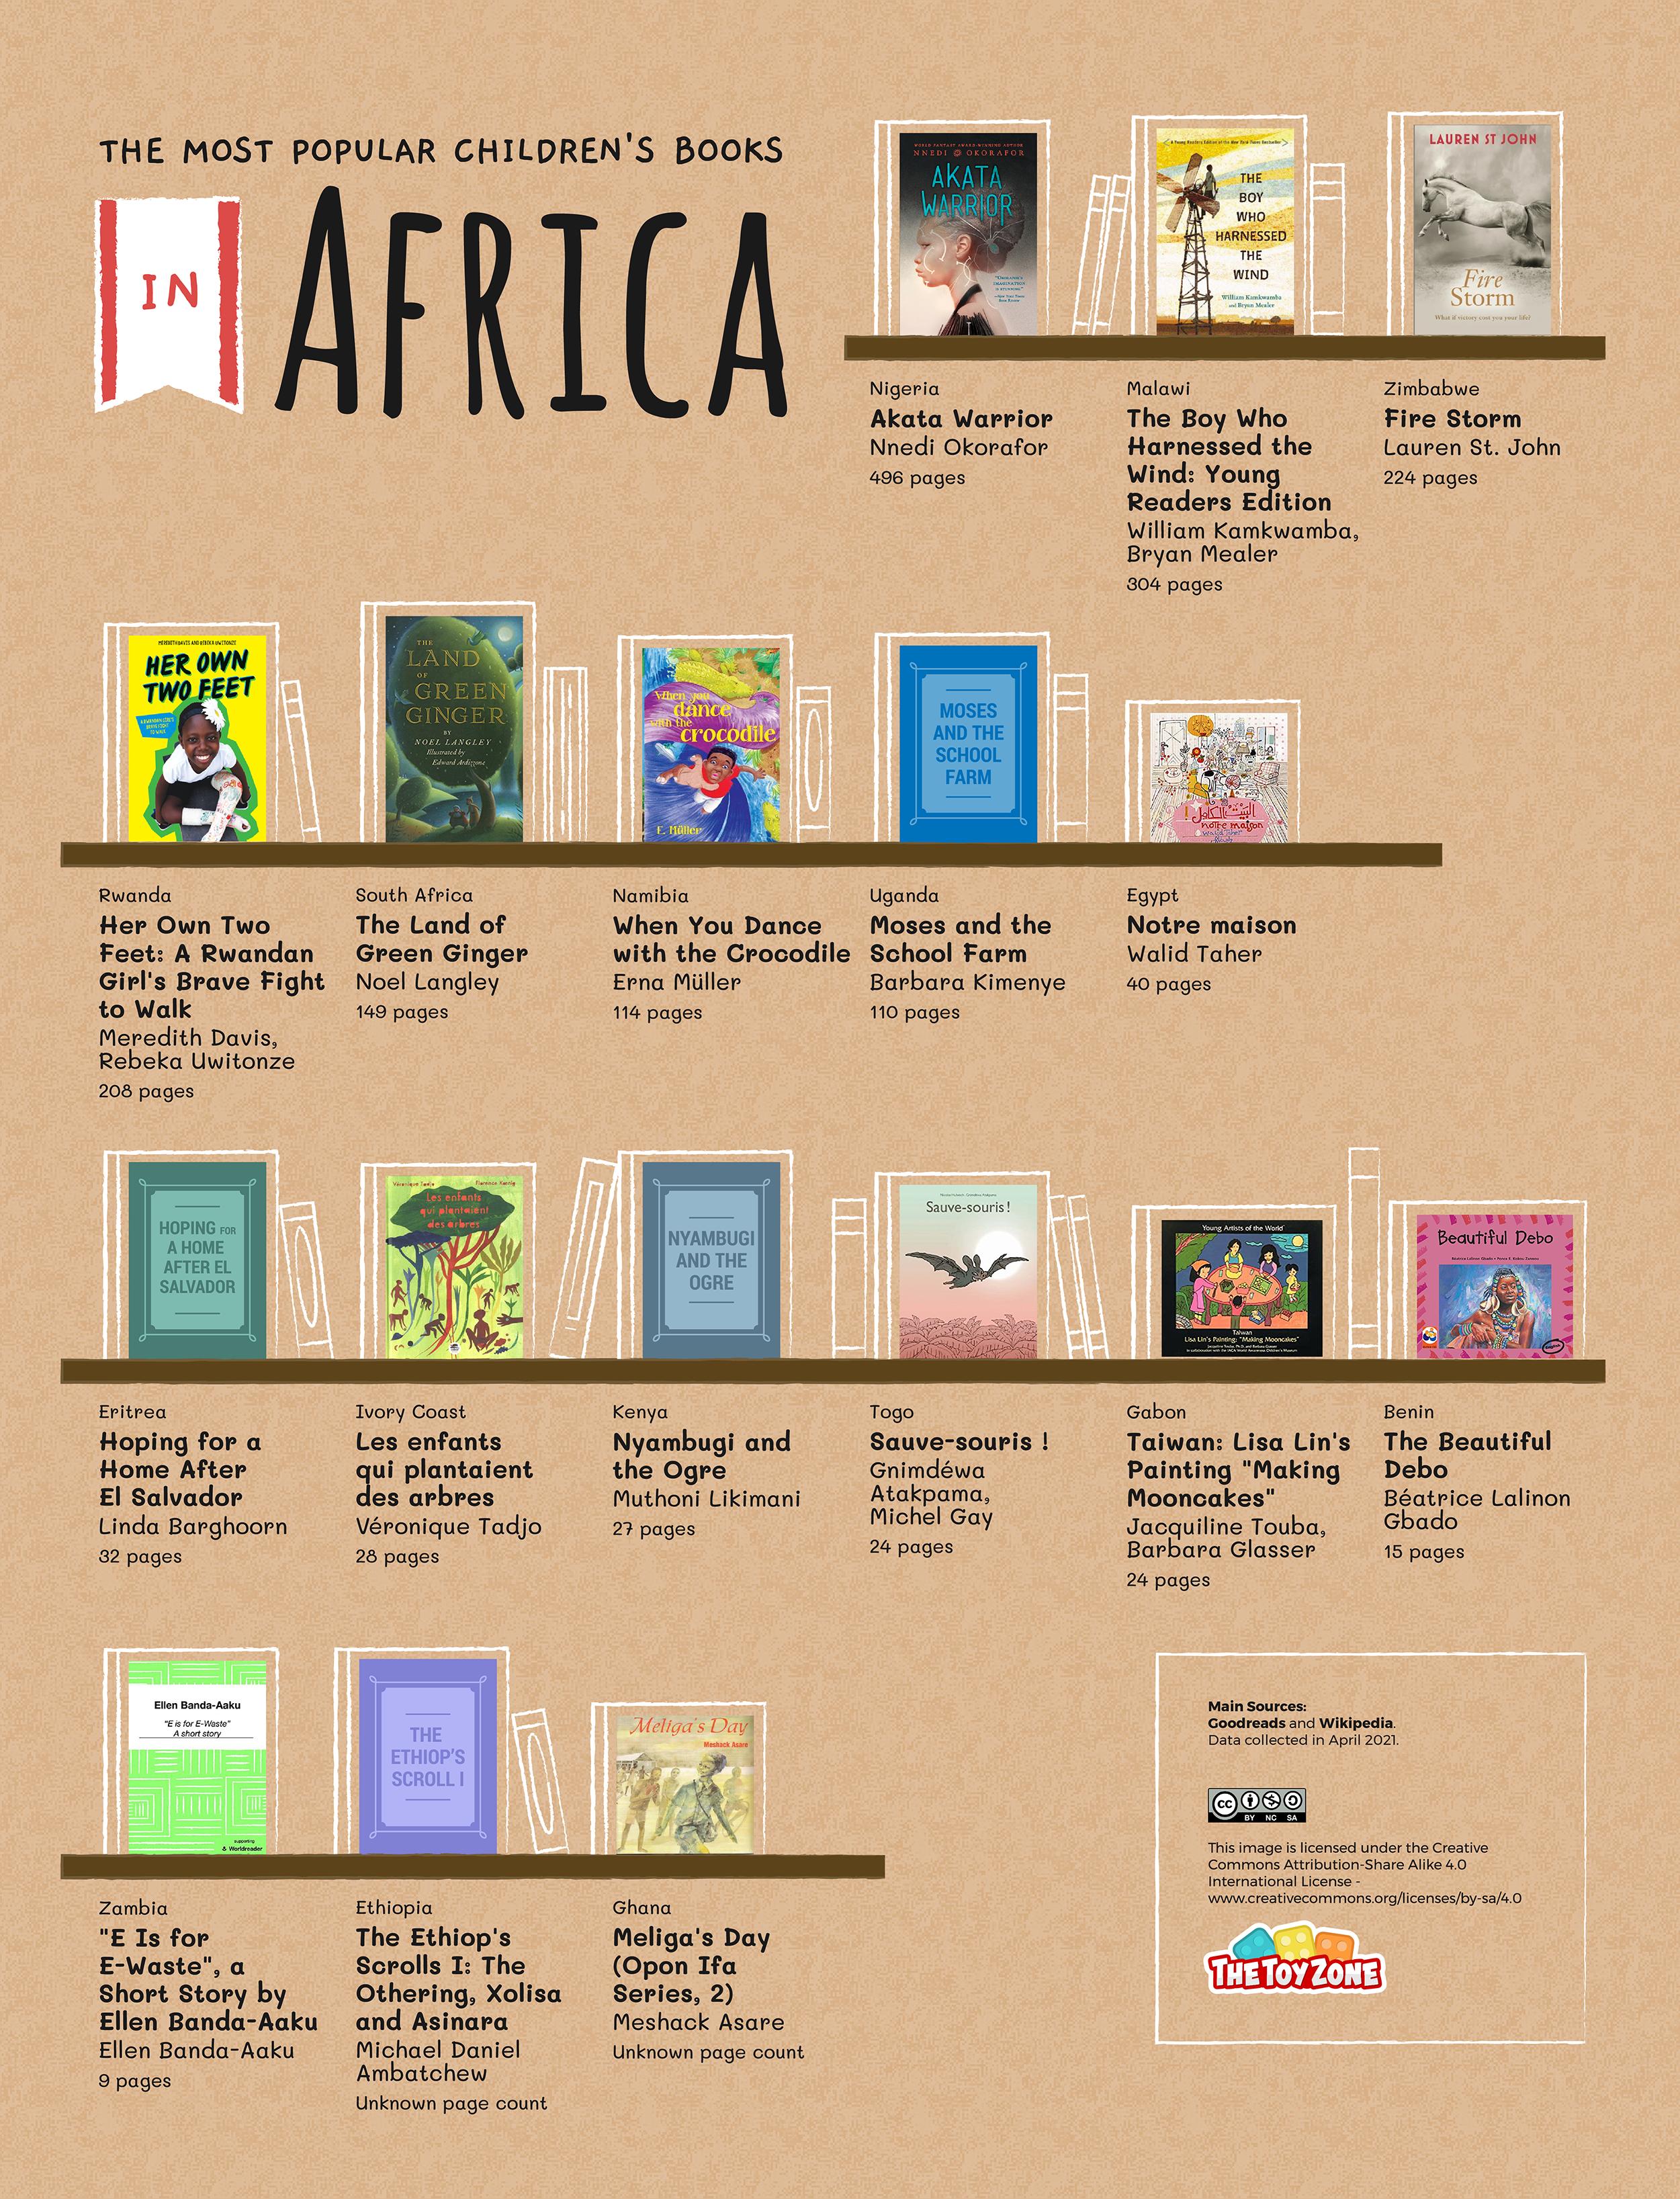 Most popular children's book in Africa bookshelf graphic